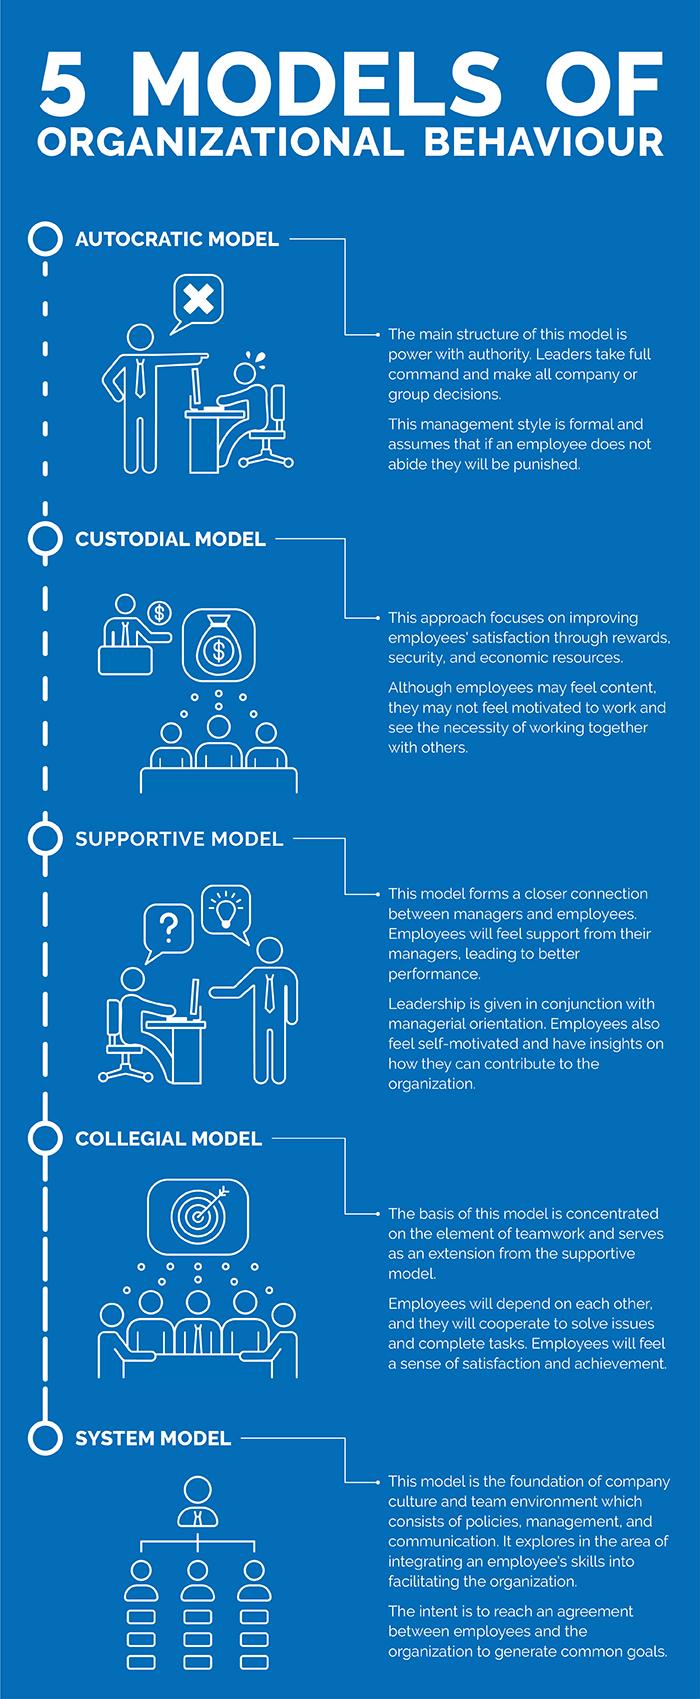 5 Models of organizational behaviour infographic-3.jpg